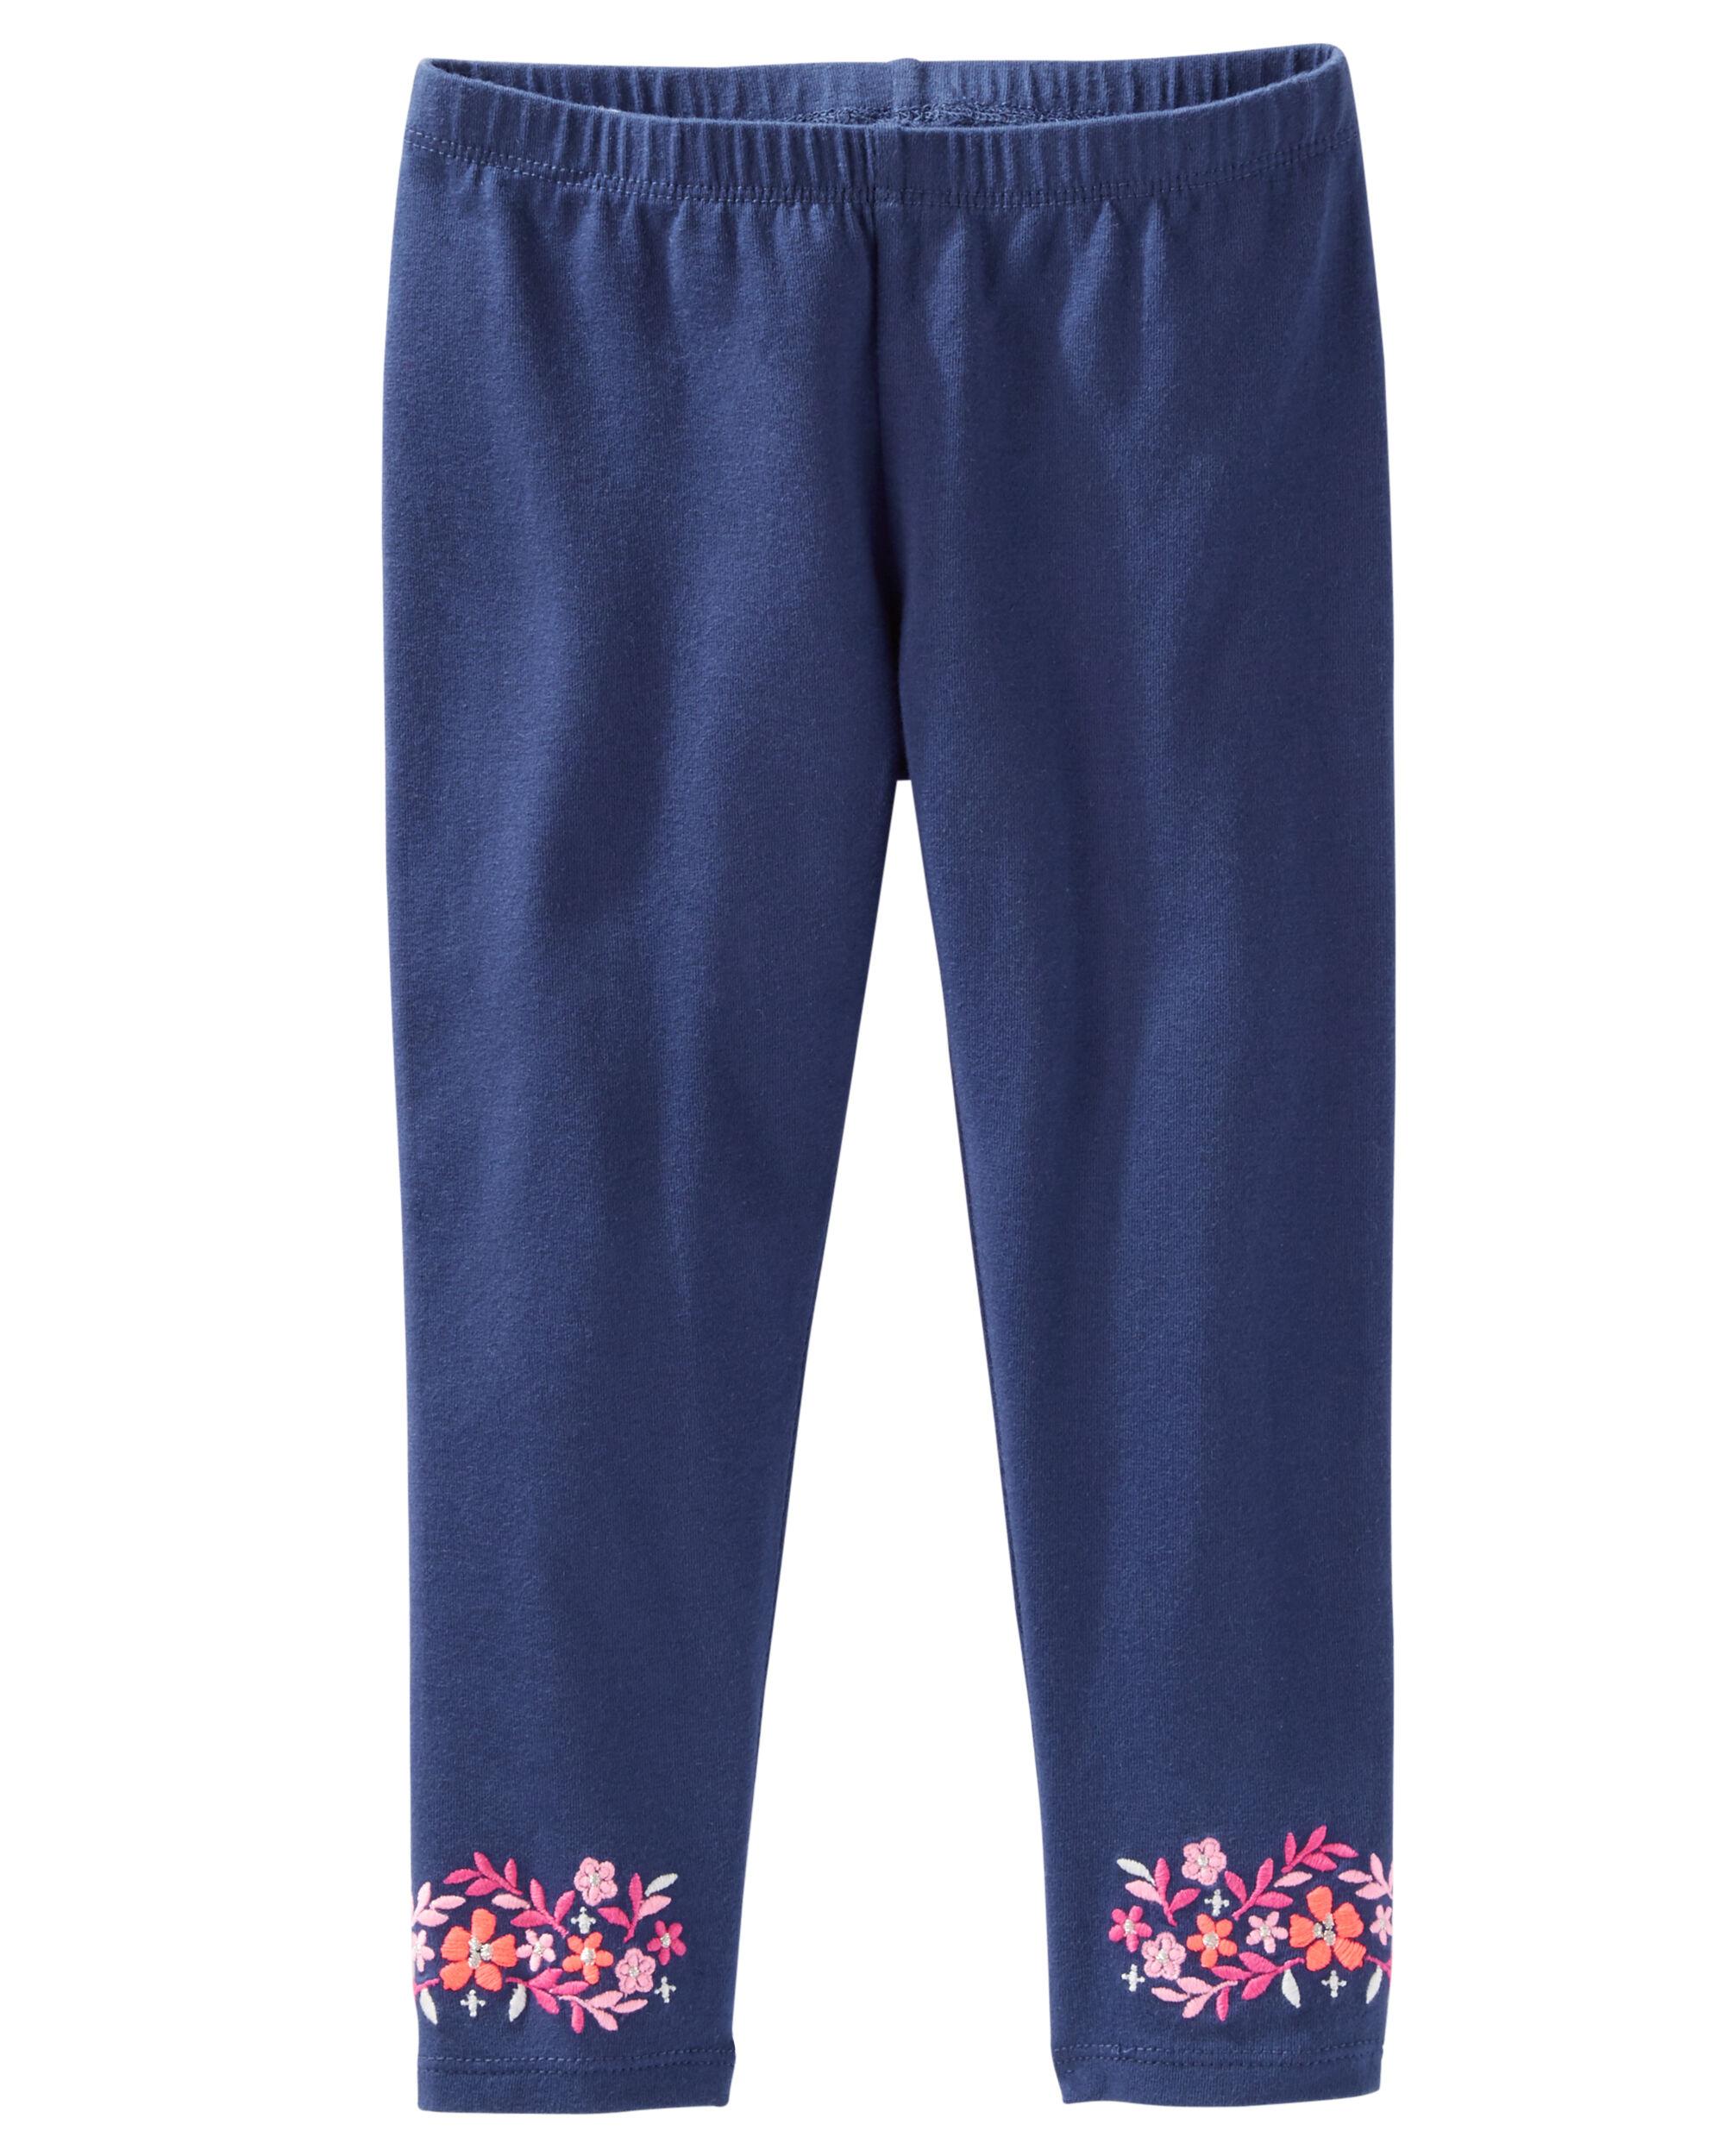 OshKosh BGosh Stretch Floral Jeans Size 8 Blue